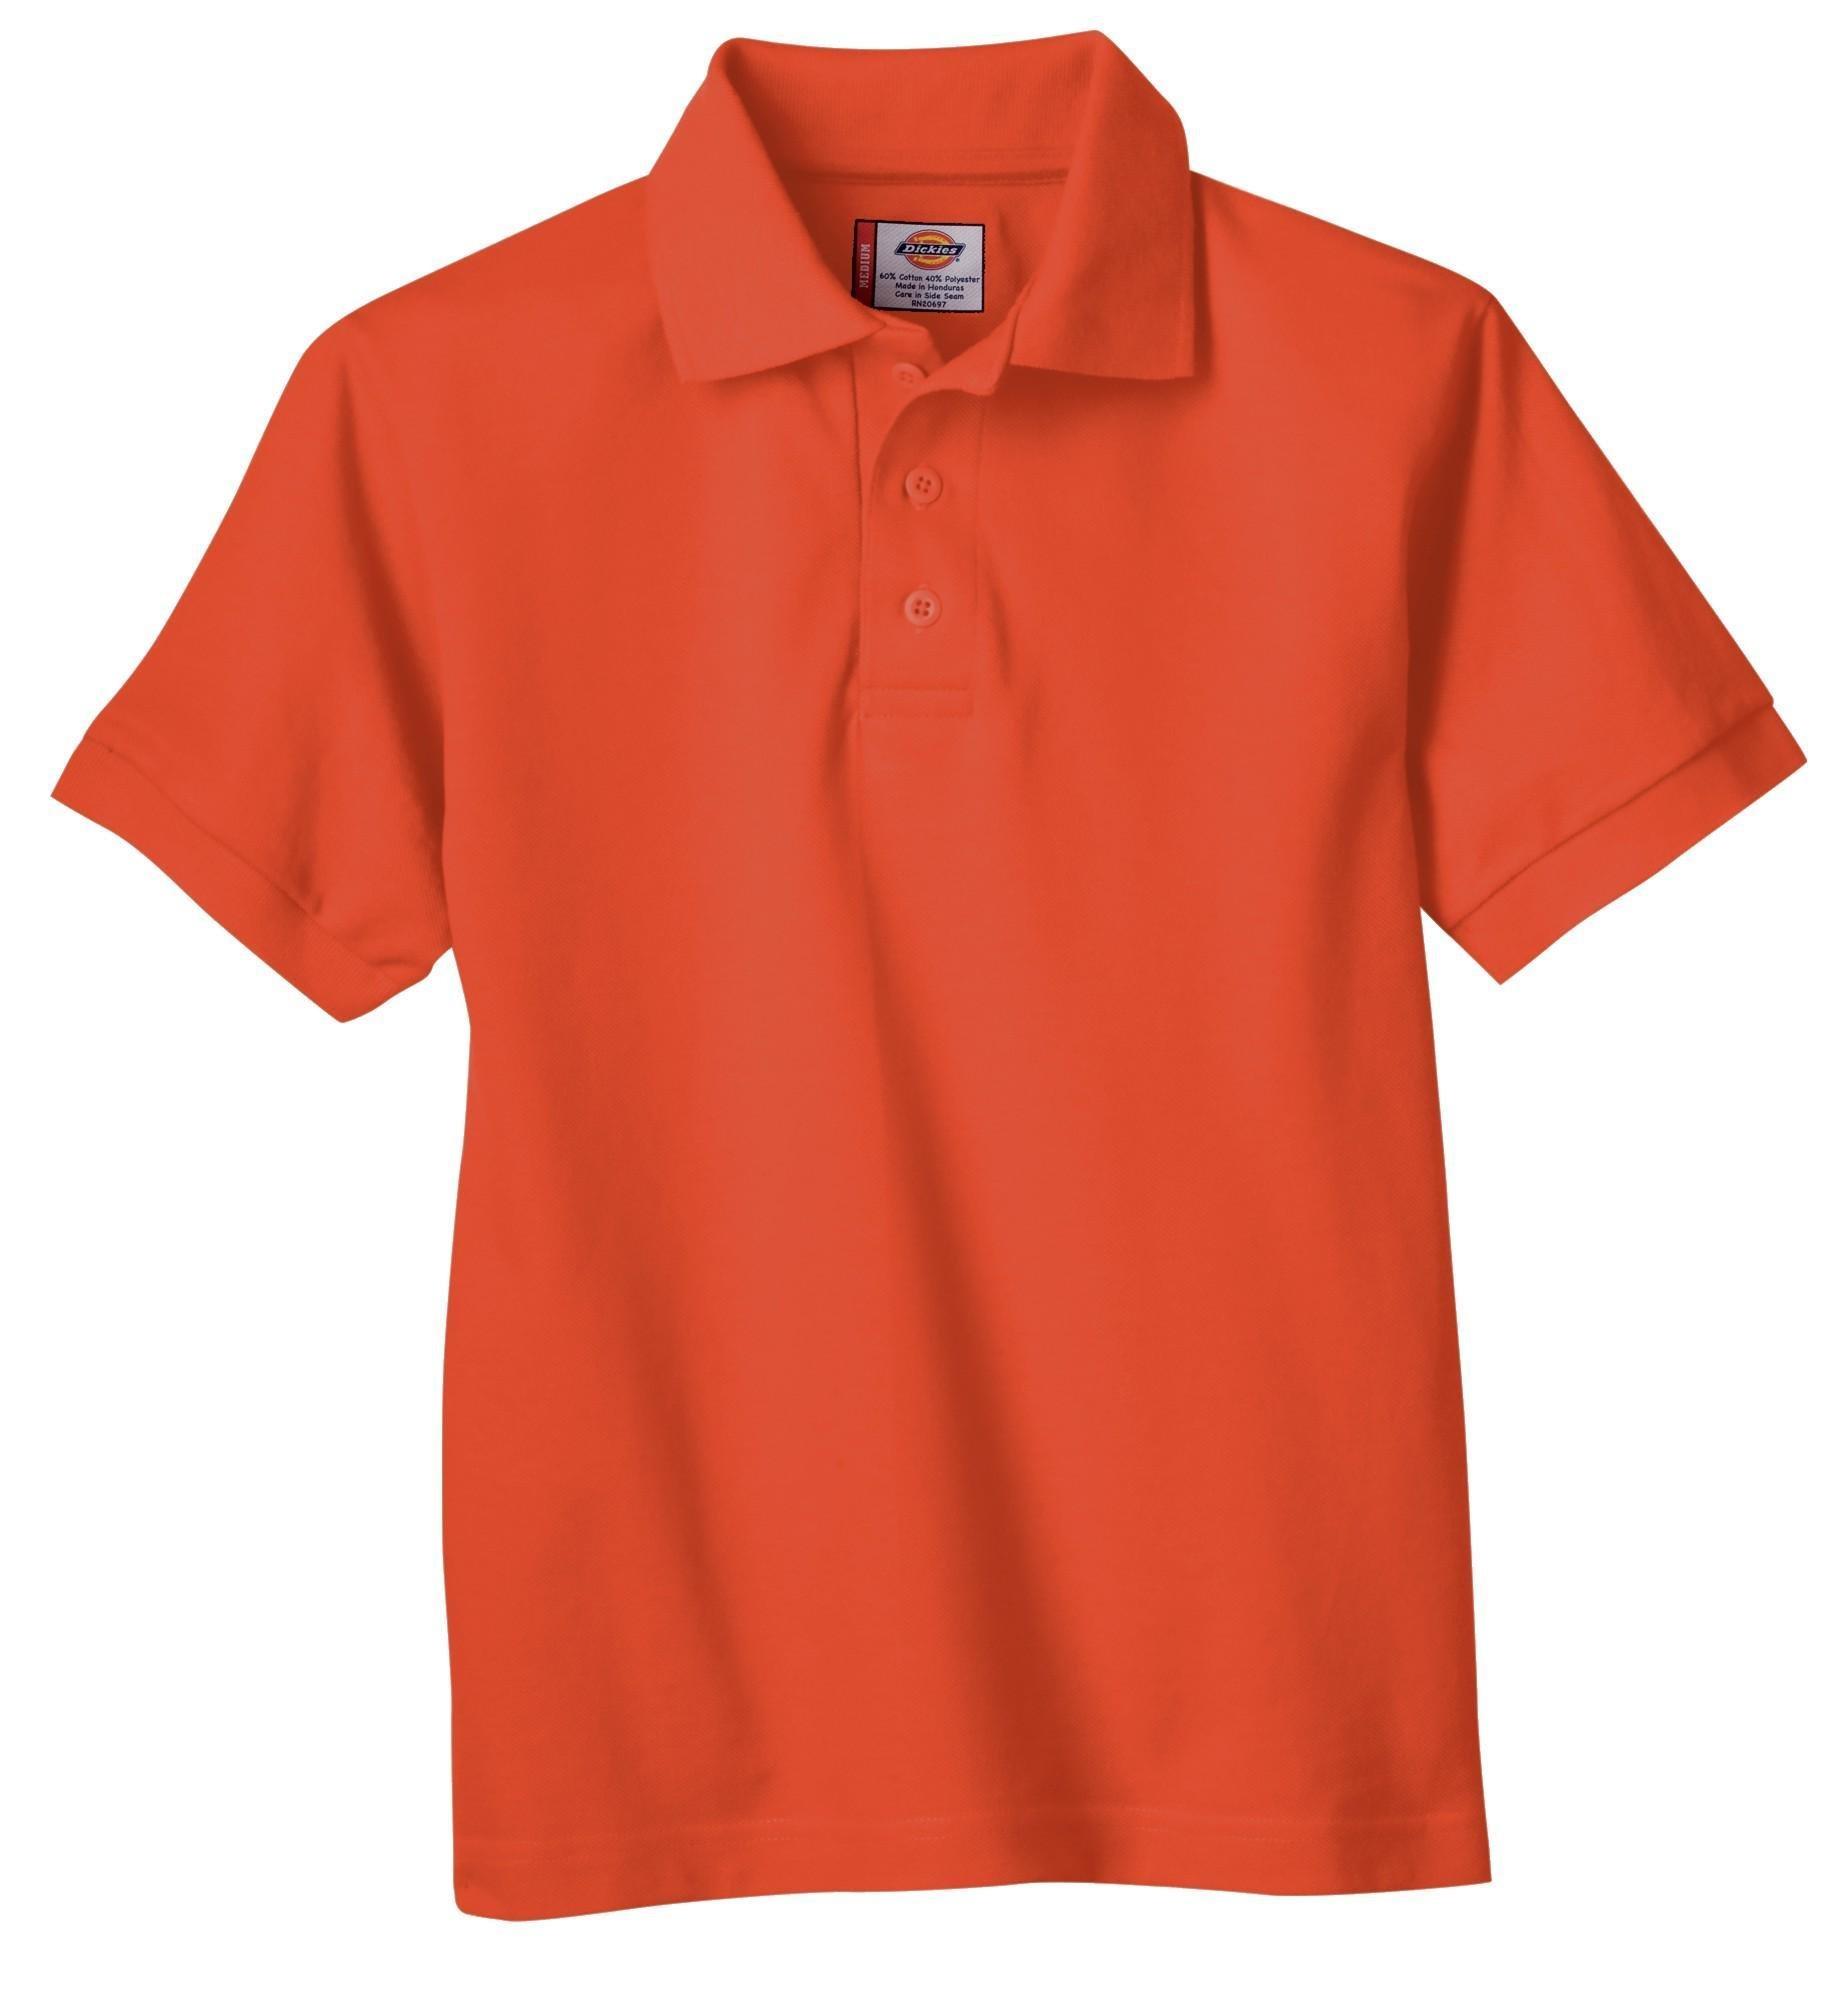 Dickies Big Boys' Short Sleeve Pique Polo Shirt, Orange, Medium